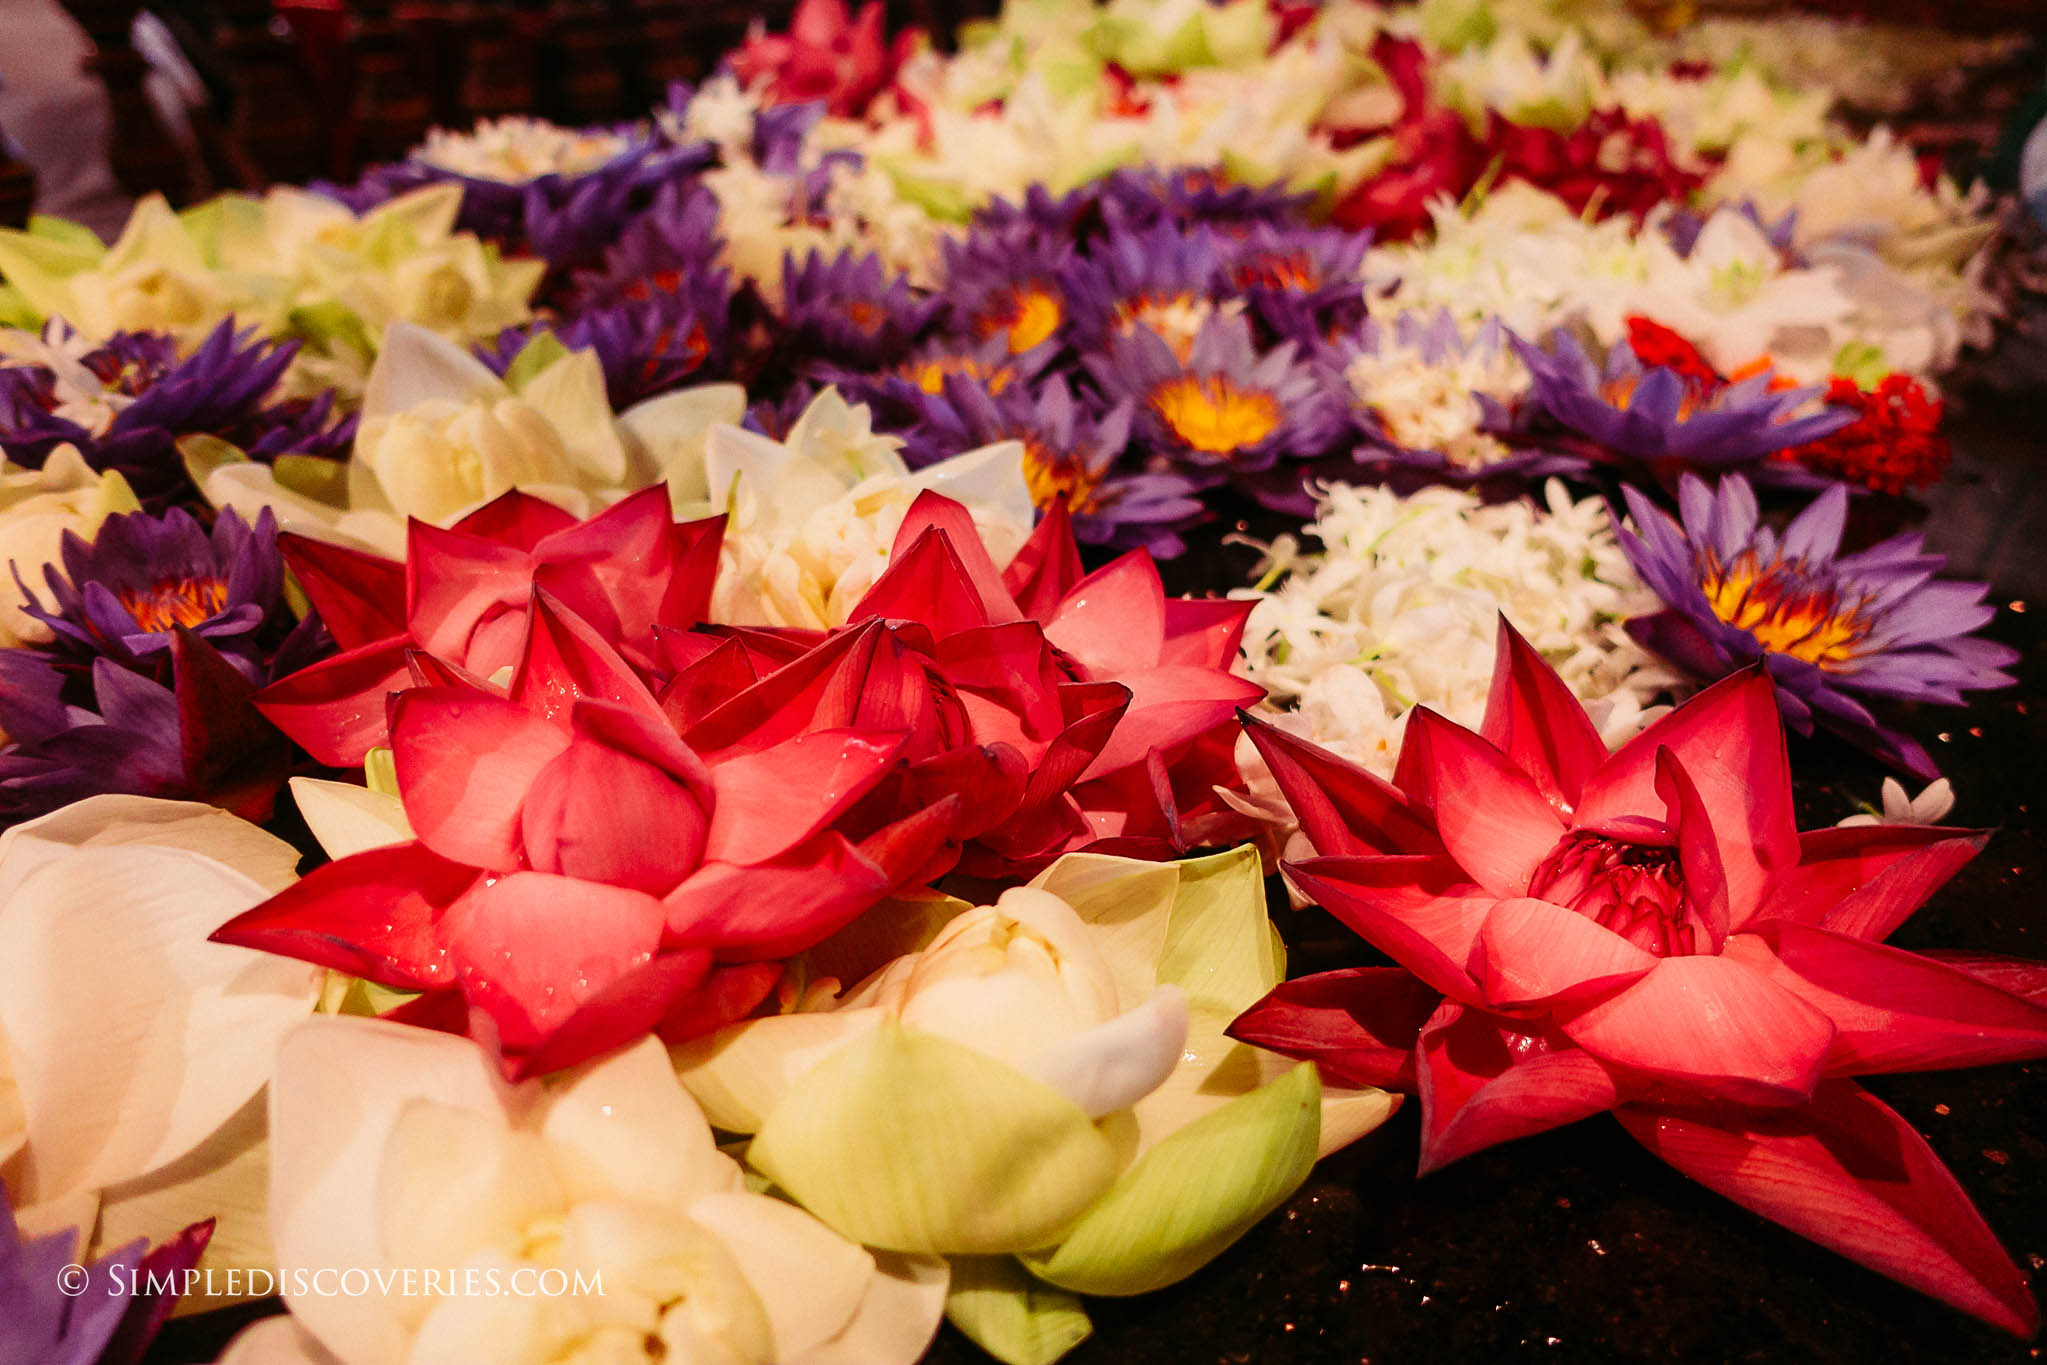 srilanka_flower_offerings